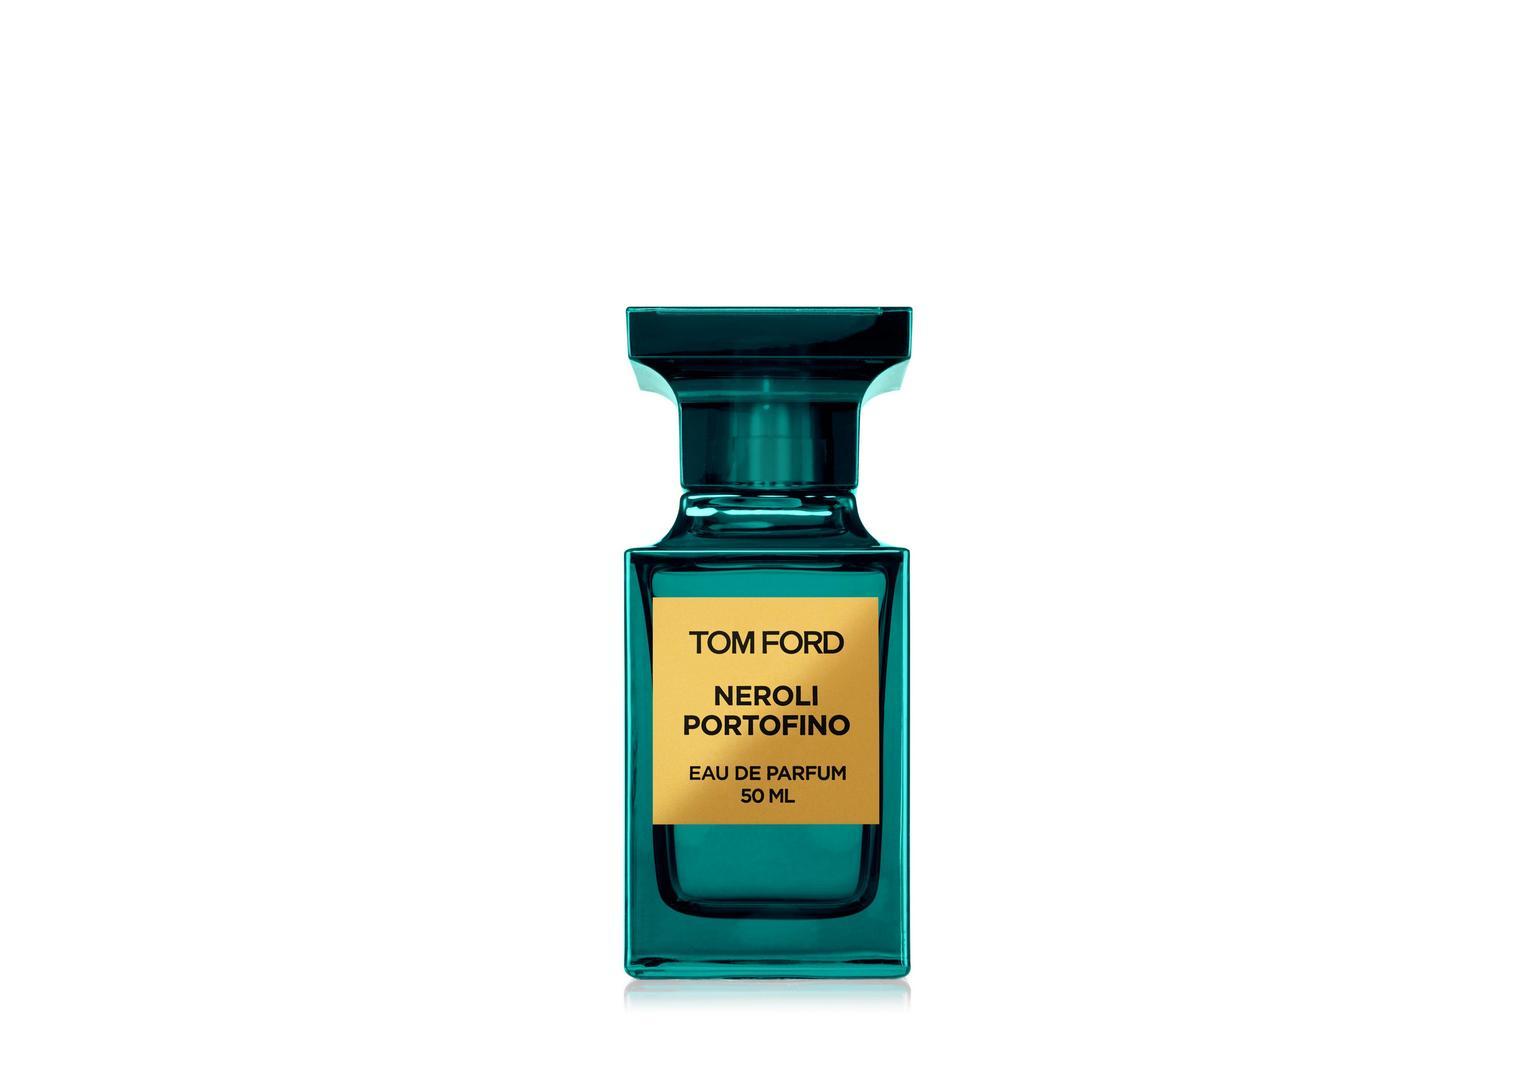 Tom Ford Neroli Portofino 250 Ml Fragrance